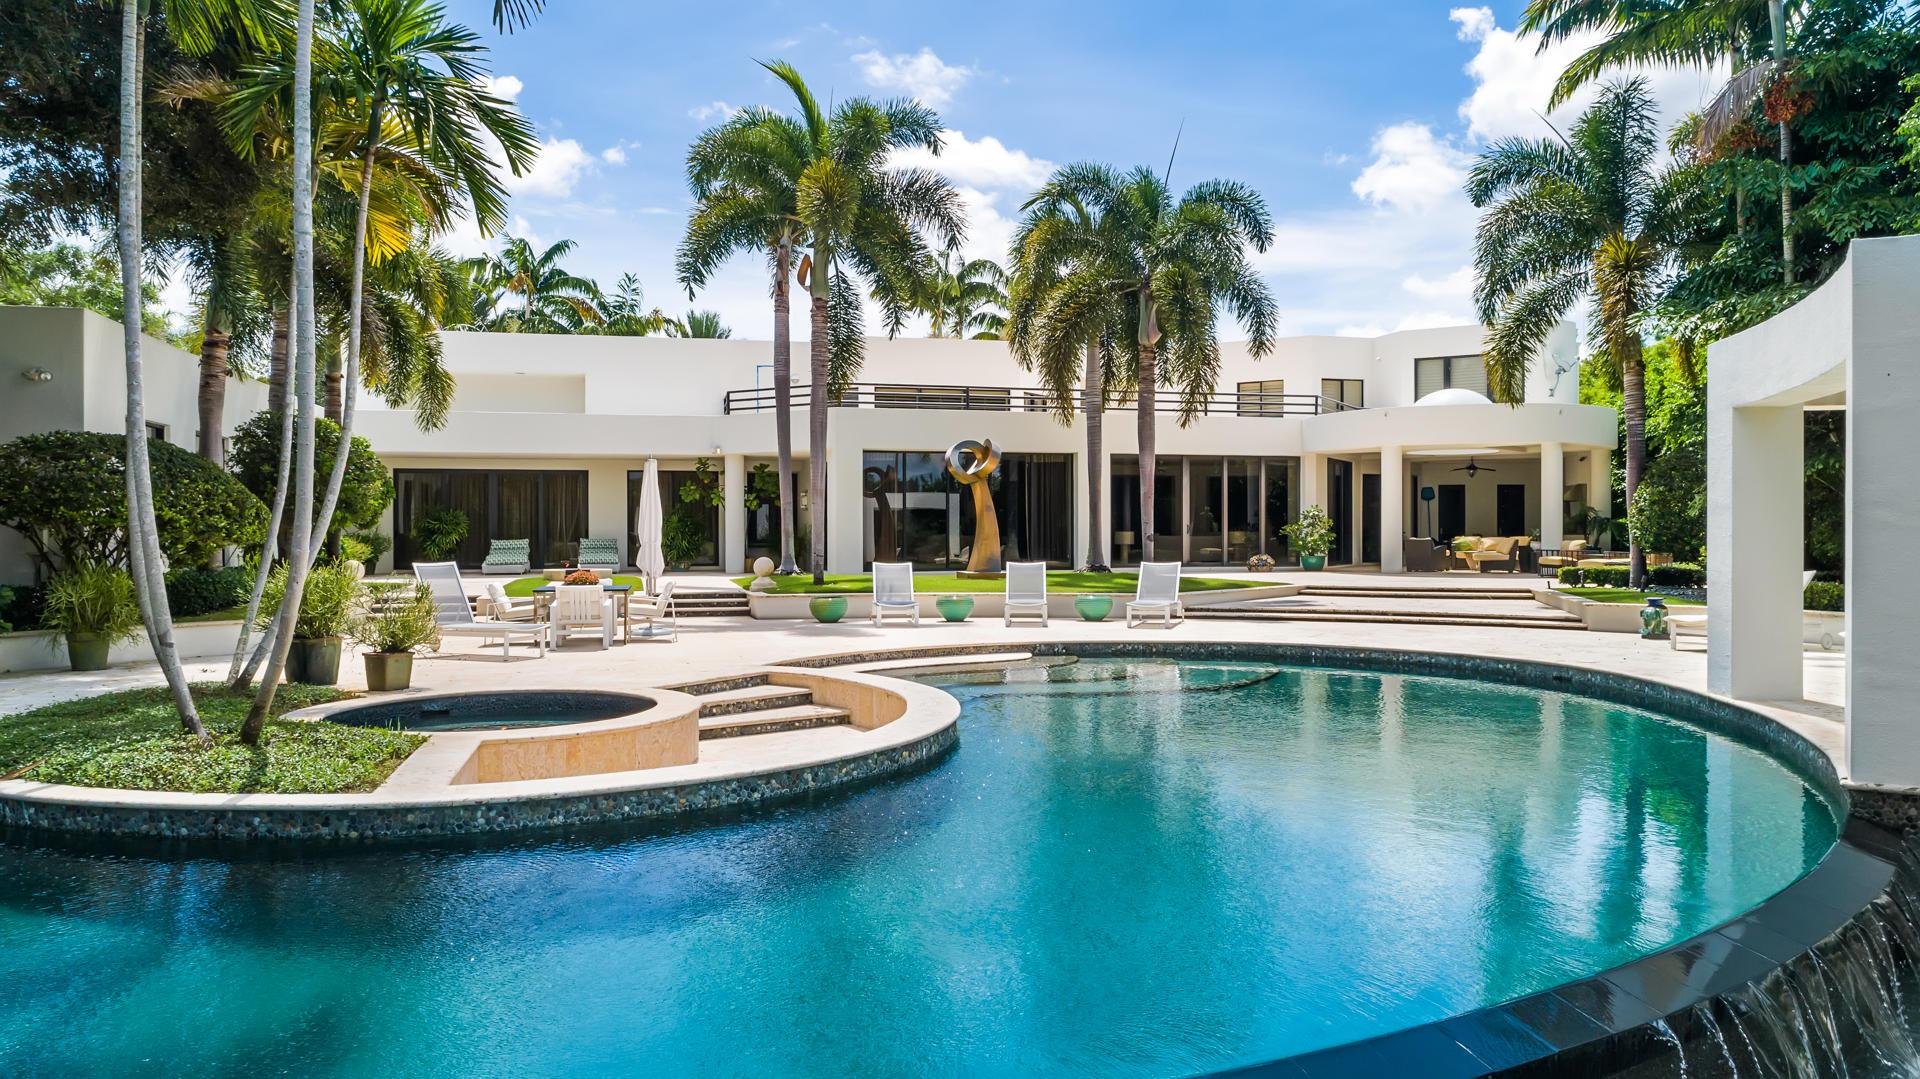 18211 Long Lake Drive, Boca Raton, Florida 33496, 5 Bedrooms Bedrooms, ,6.2 BathroomsBathrooms,Single family detached,For sale,Long Lake,RX-10621741